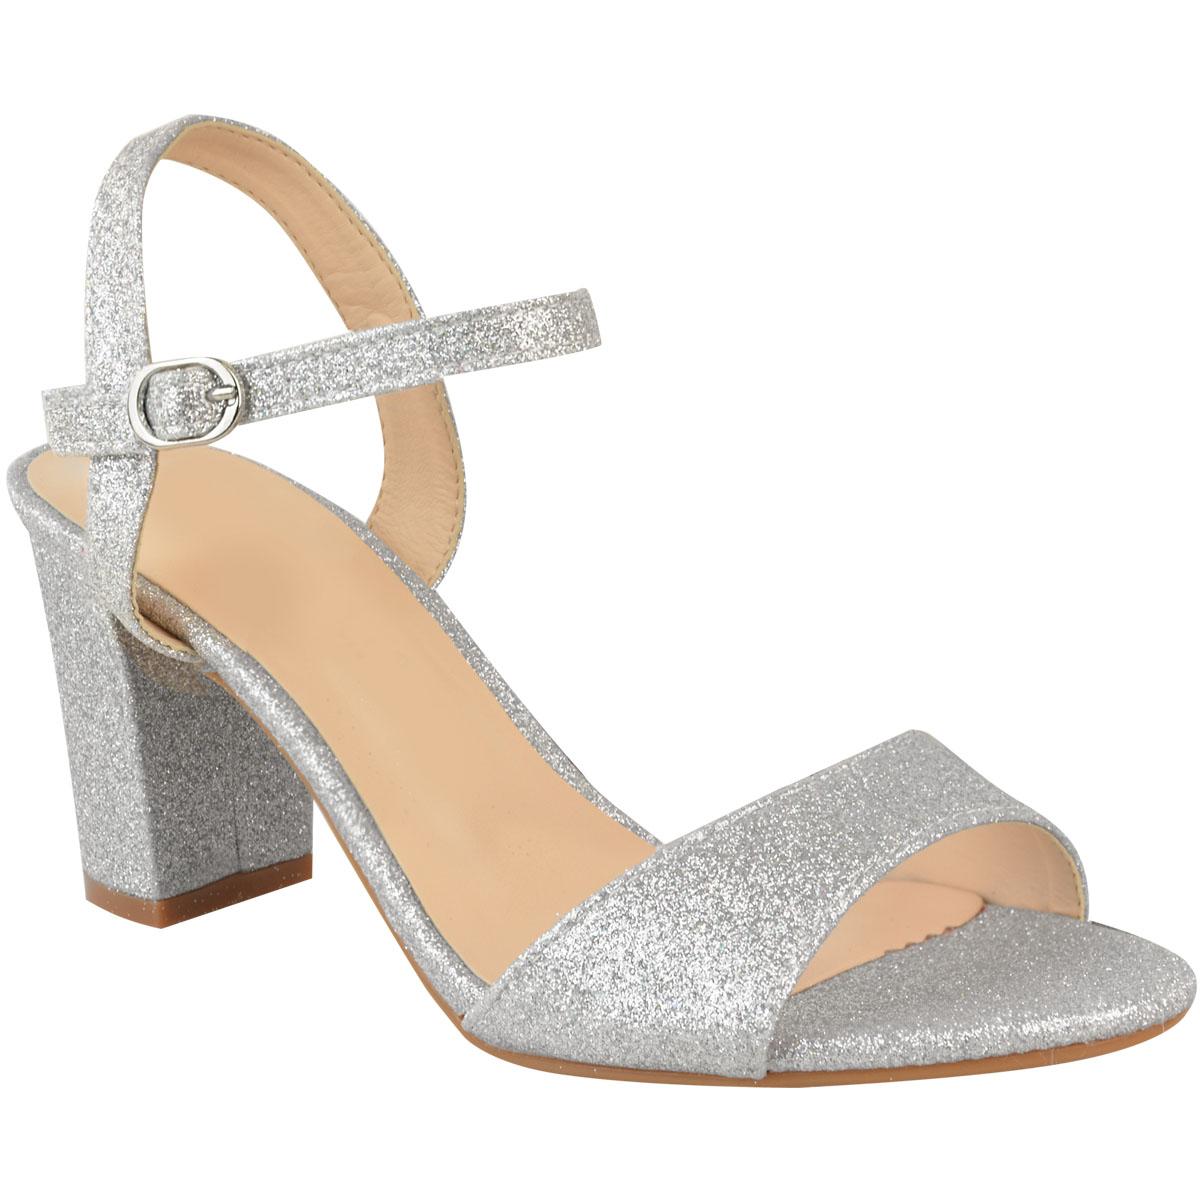 c7f78226a3ea Ladies Womens Low Block Heel Party Bridal Glitter Sandals Wedding ...